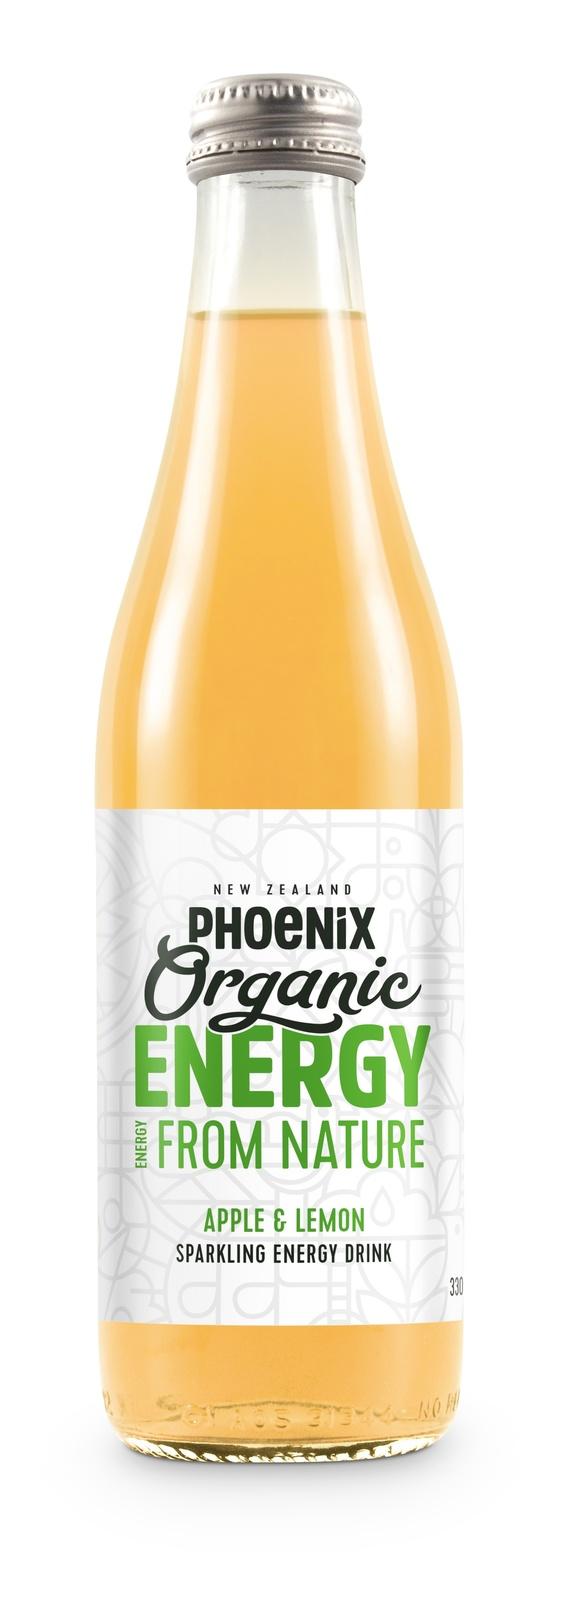 Phoenix Organic Energy - Apple & Lemon 330ml (15 Pack) image